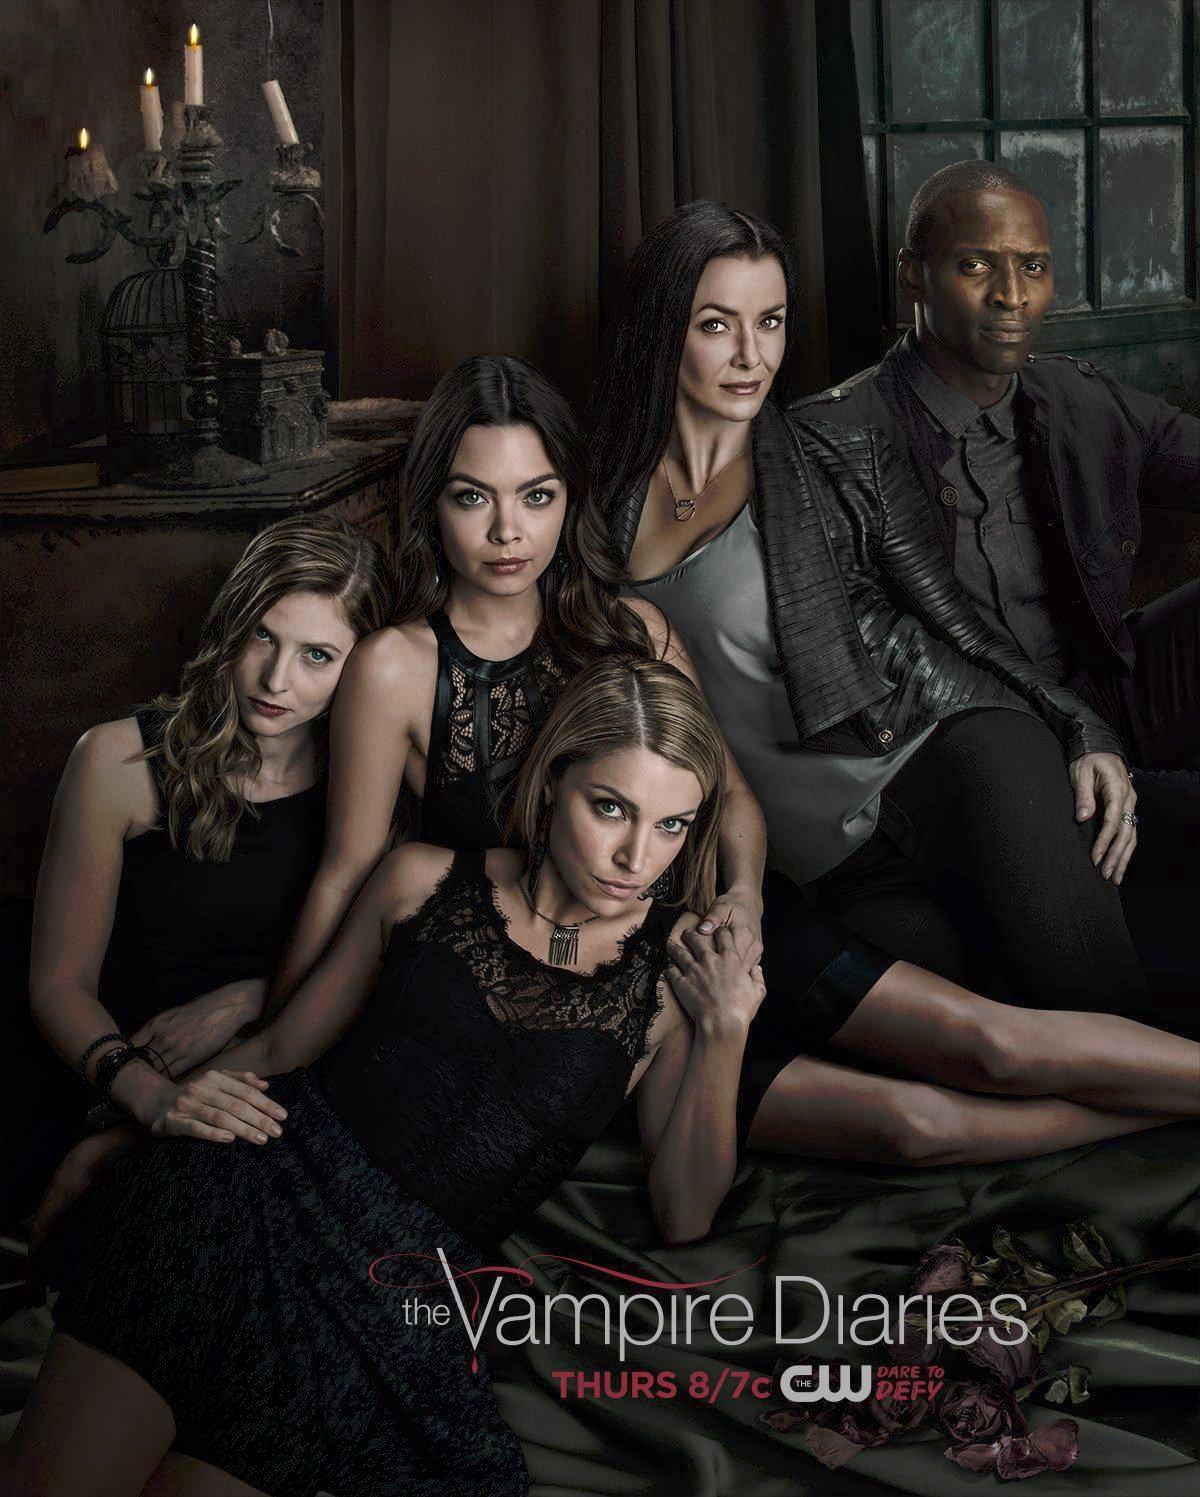 The Vampire Diaries Season 7 Streaming